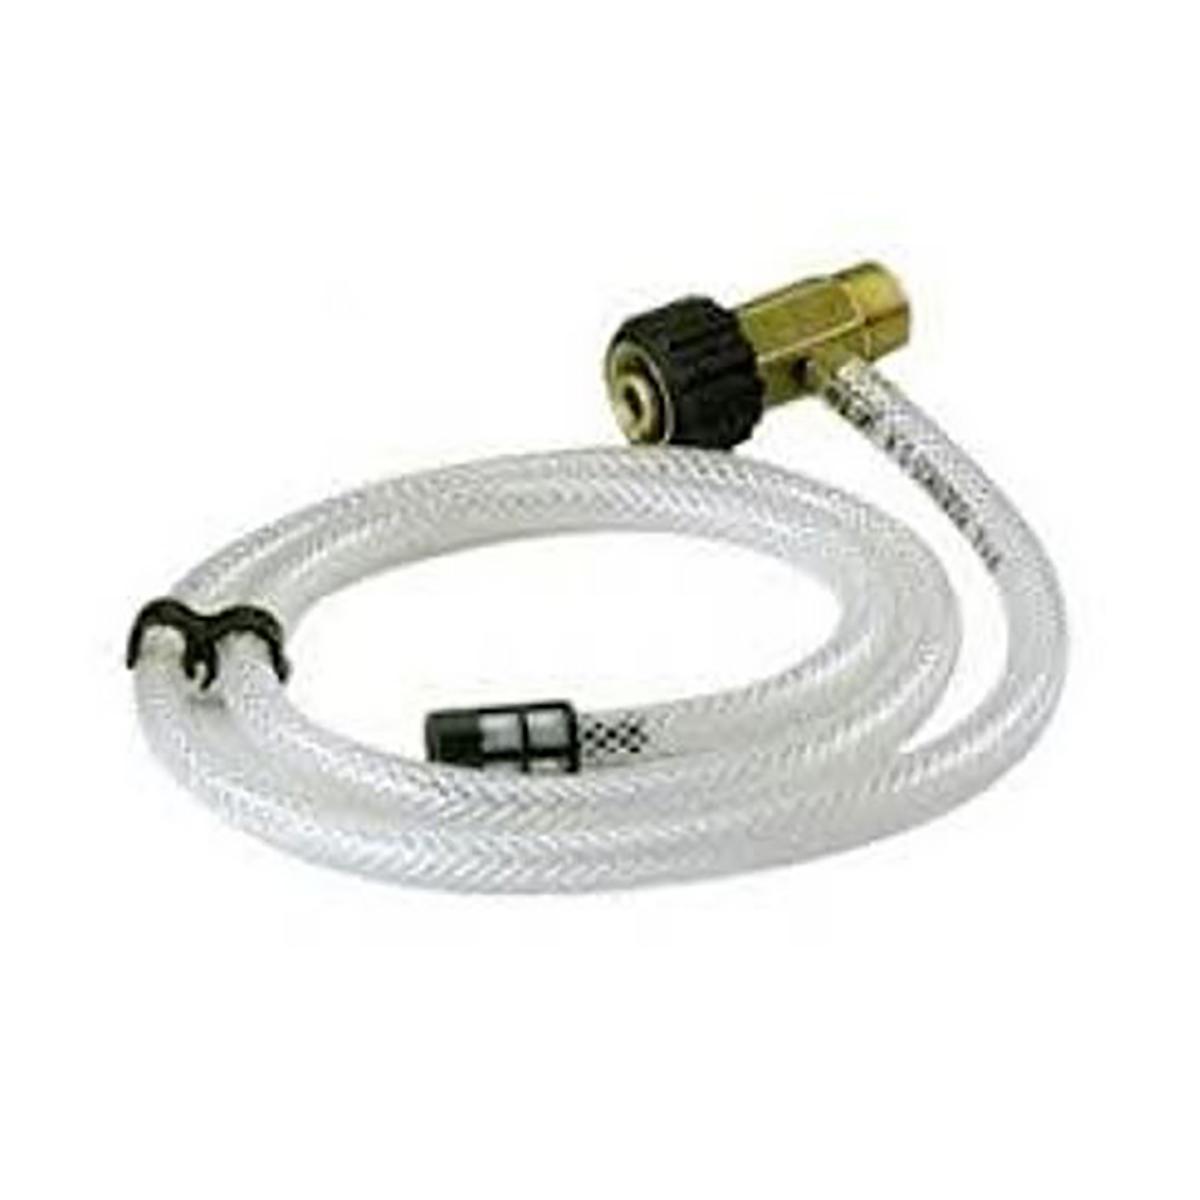 133761 - Kranzle Low Pressure Detergent Injector